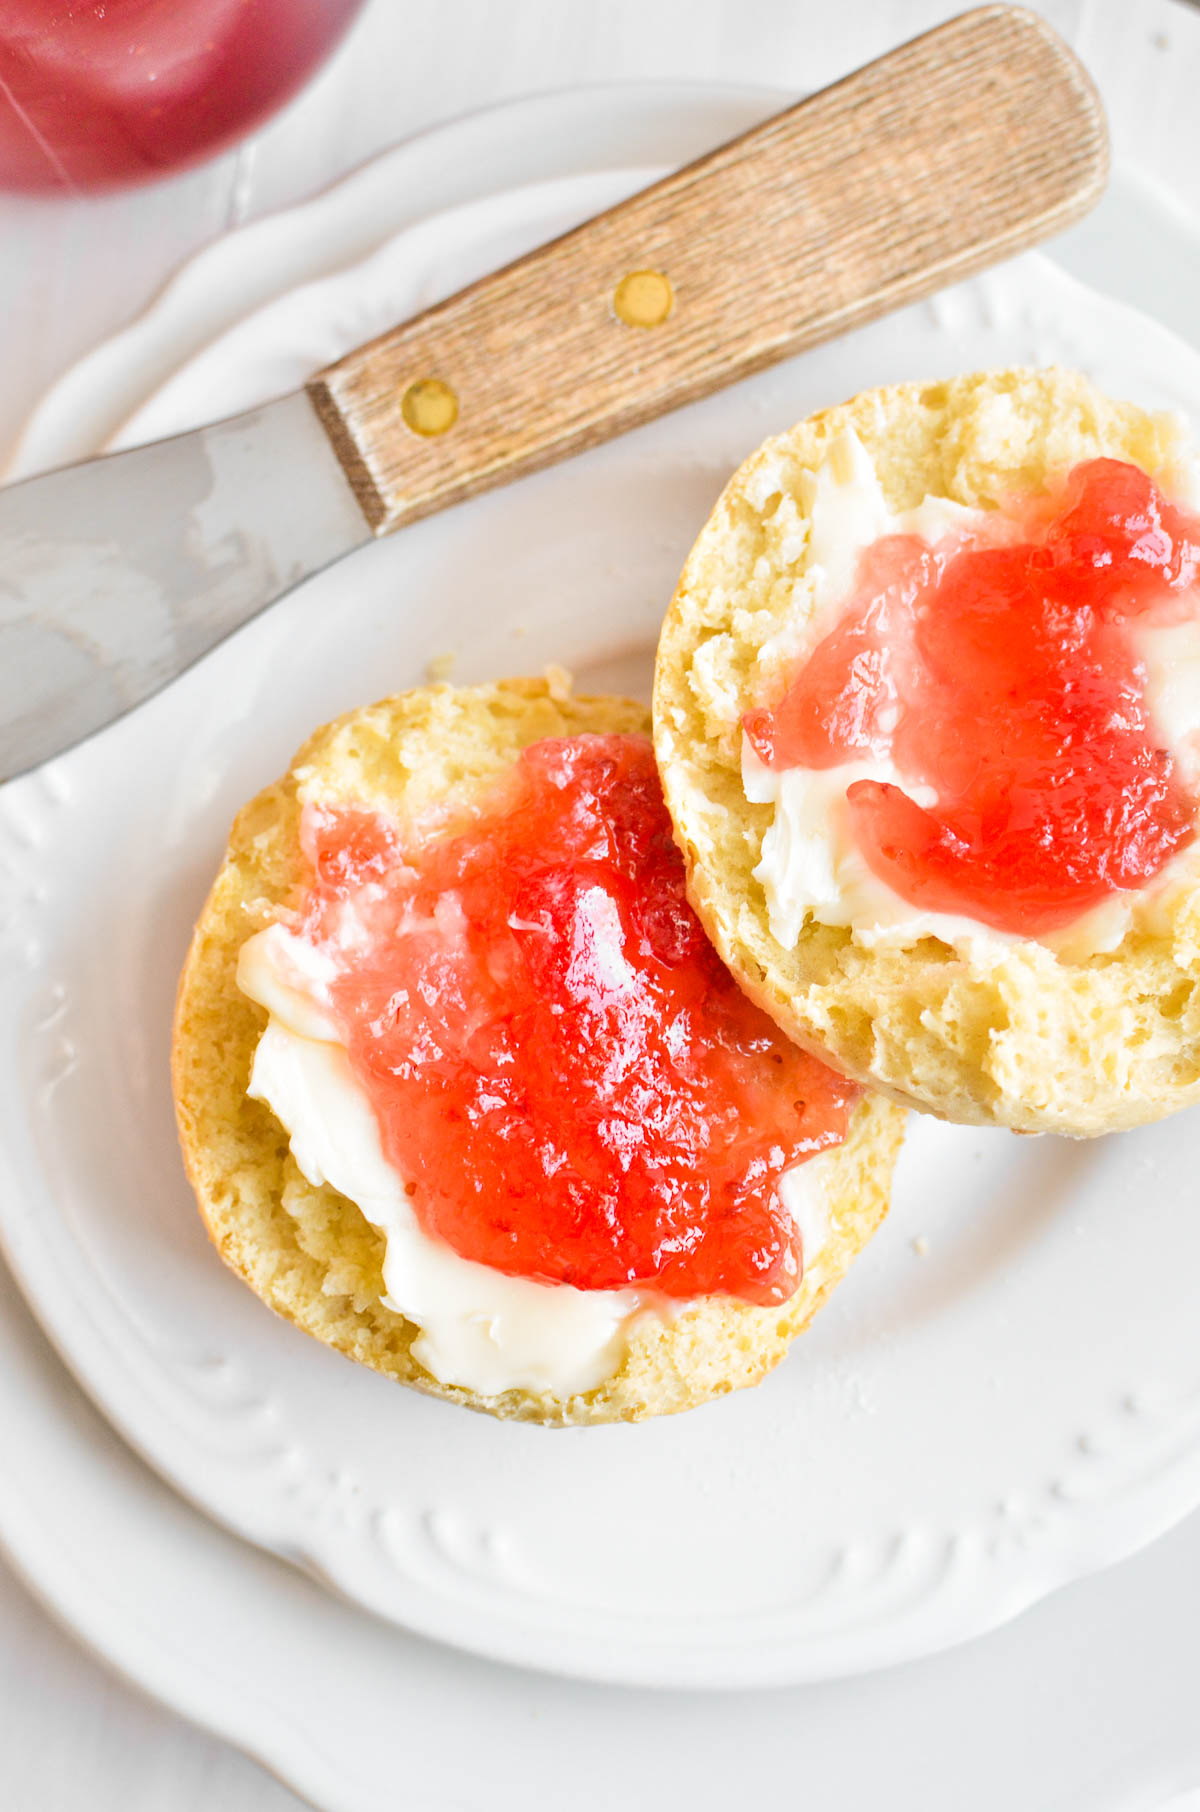 Irish soda scones with jam